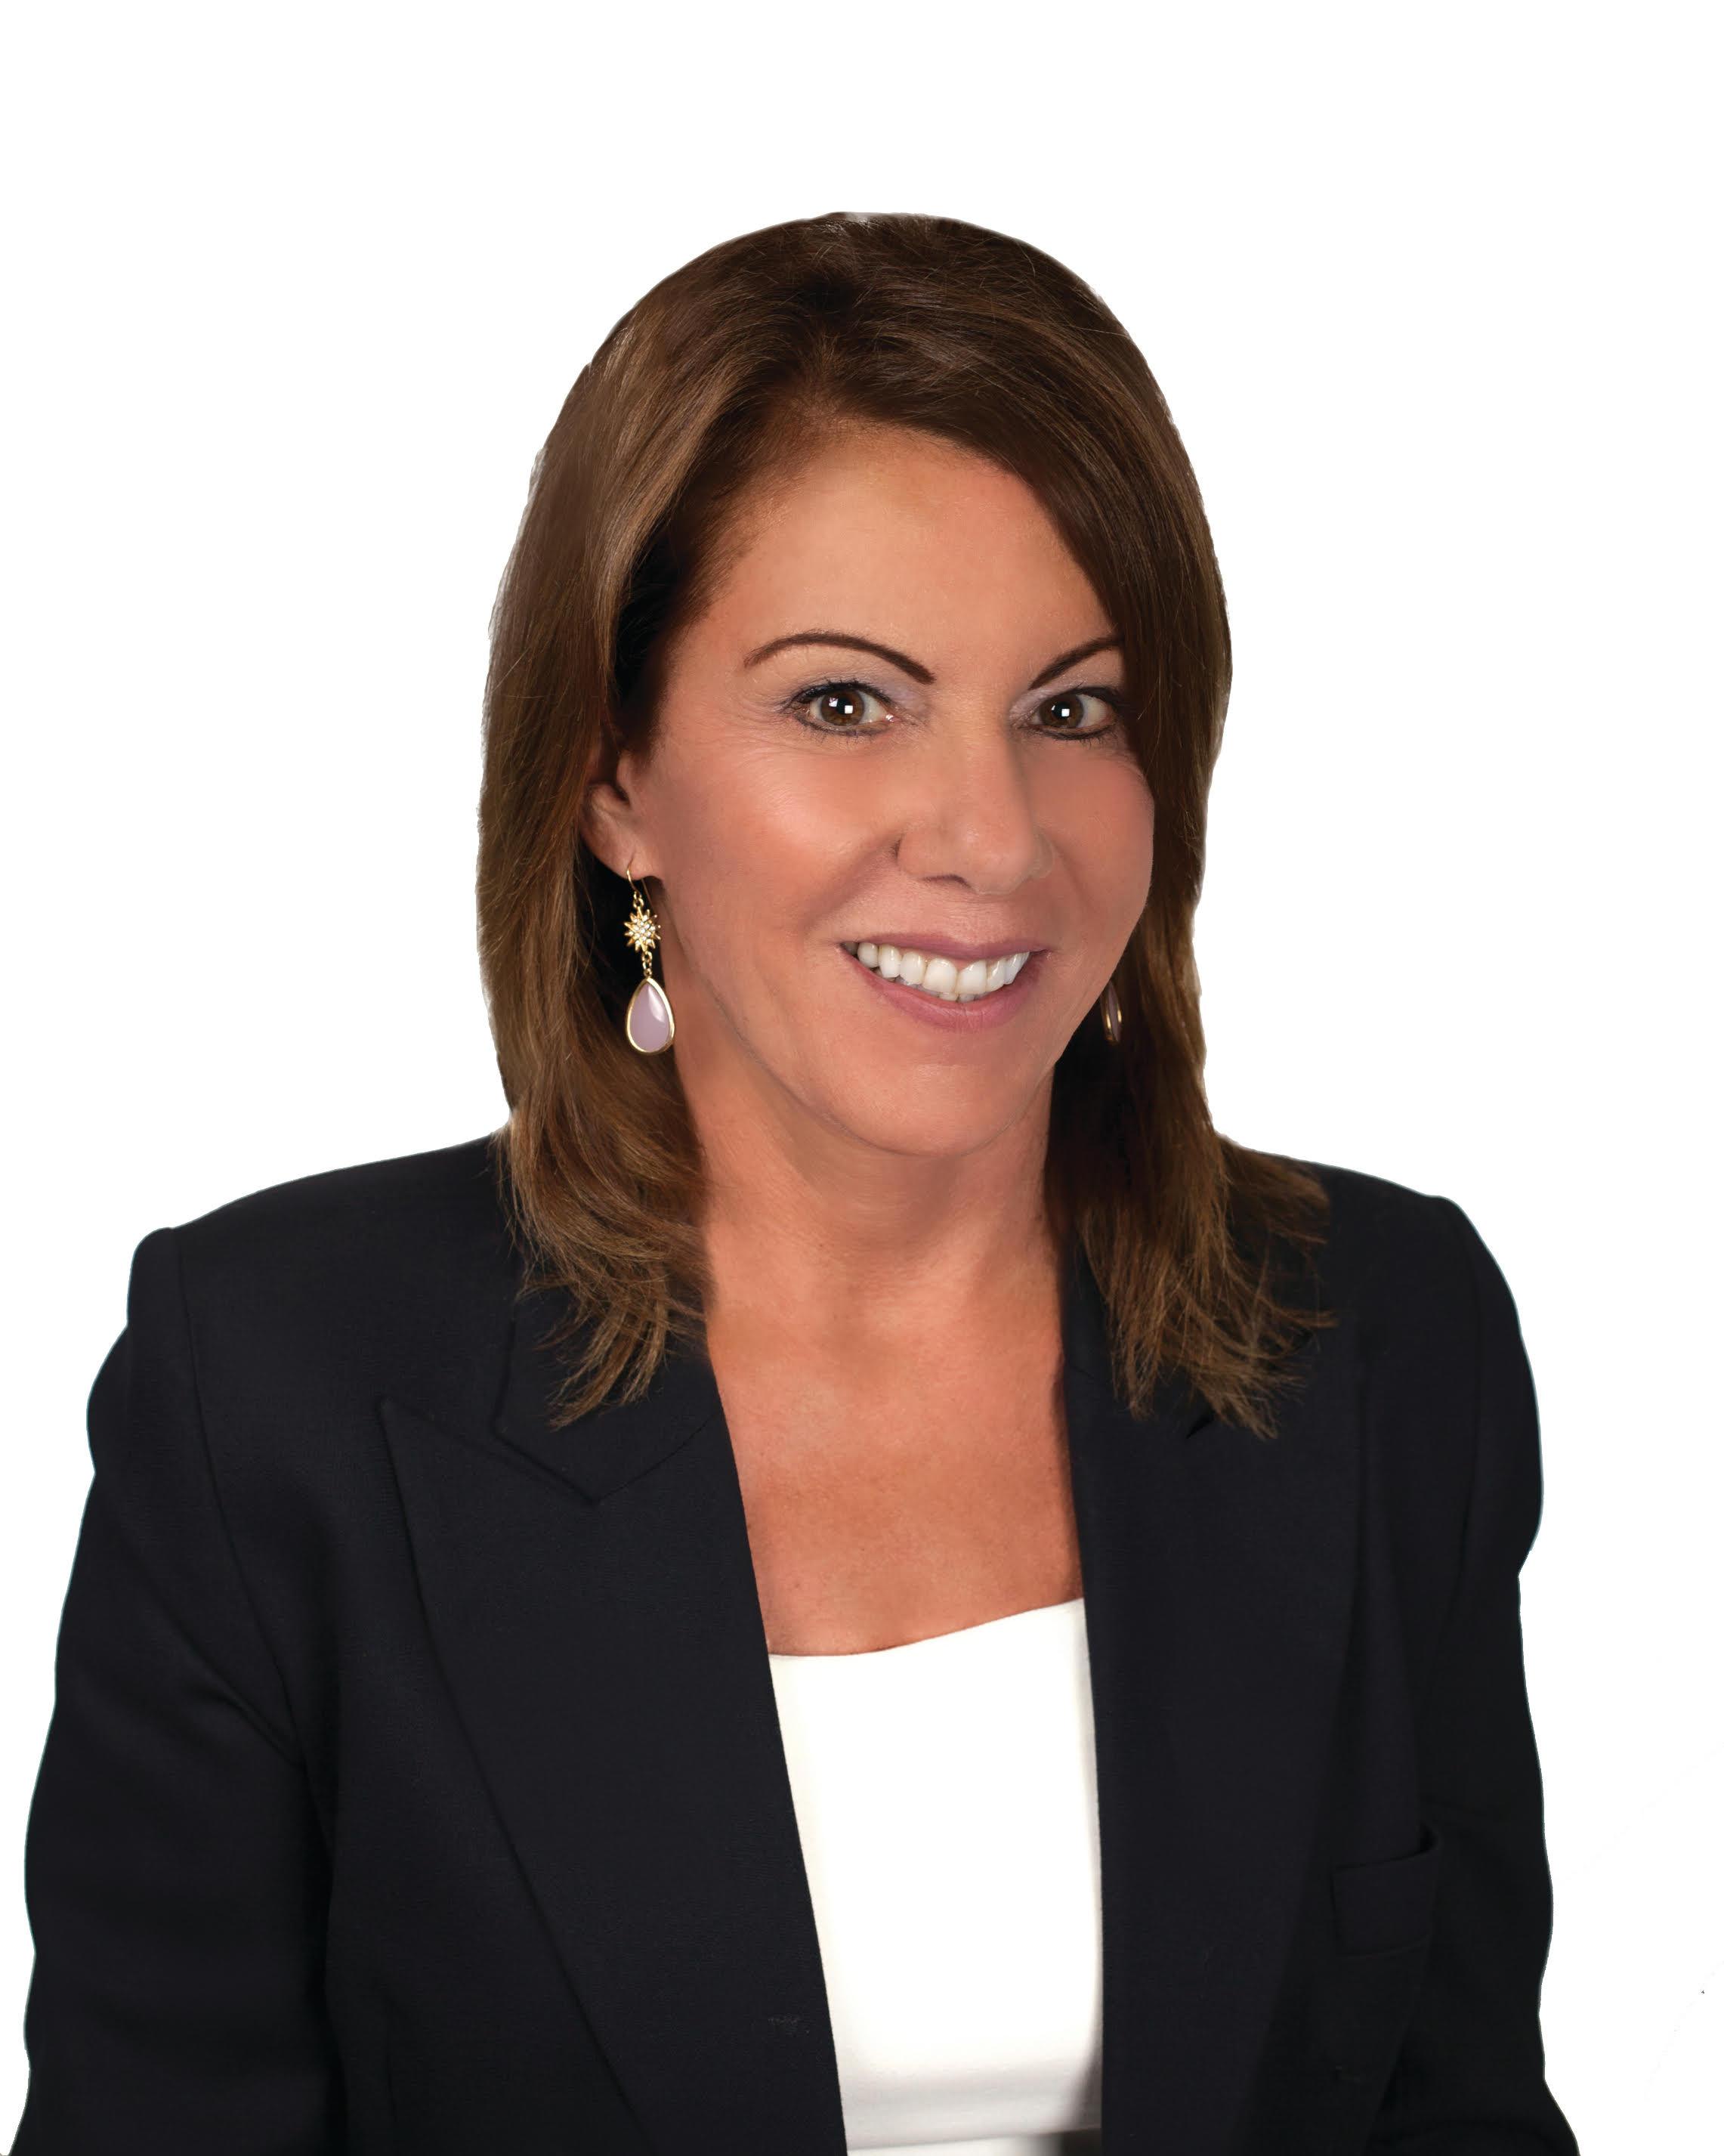 Diana De Paola Nardy